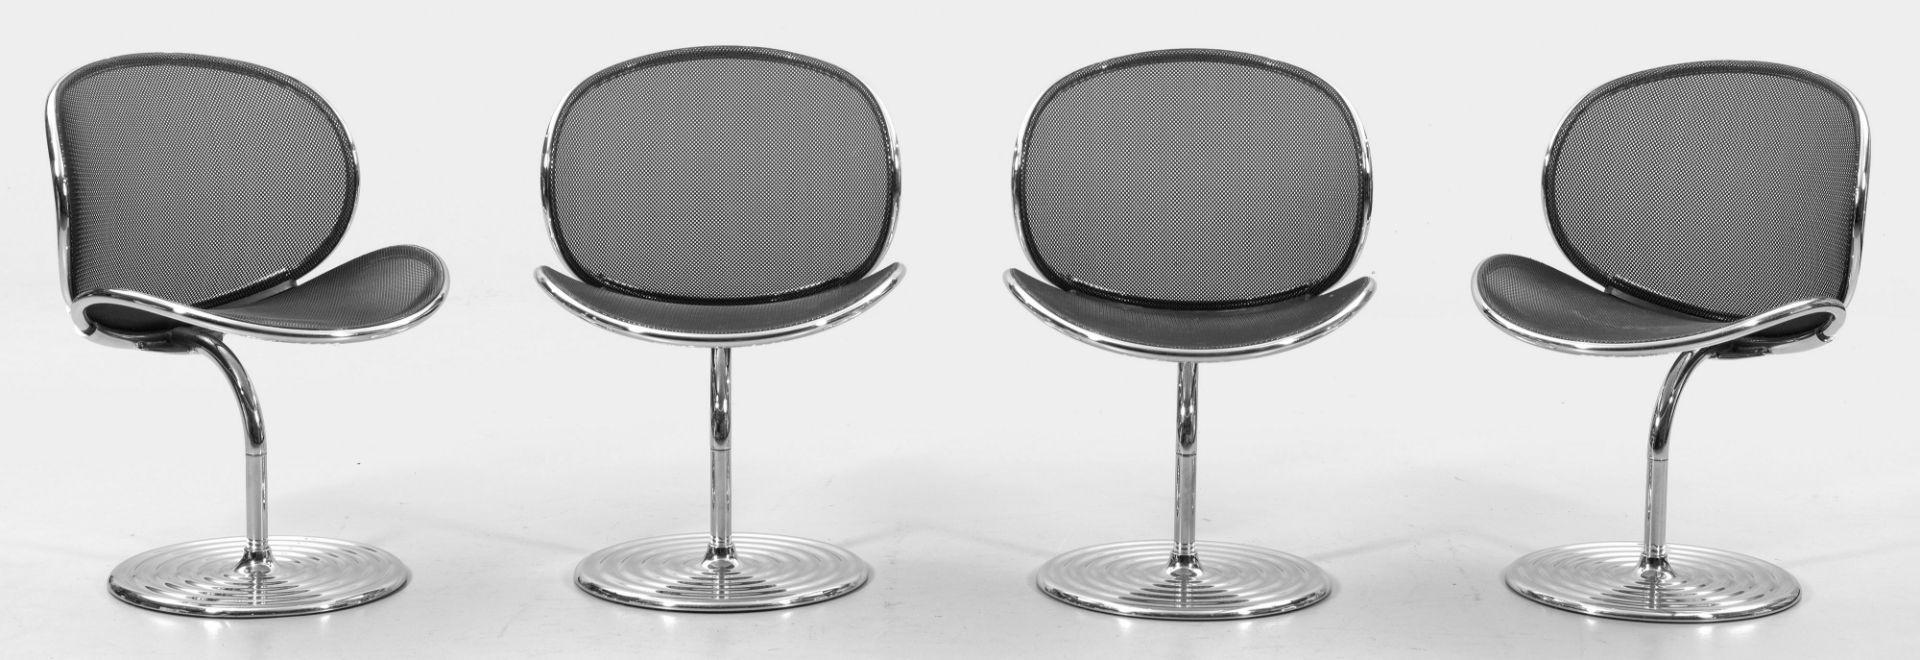 Vier O-line-Lounge Chairs von Herbert Ohl